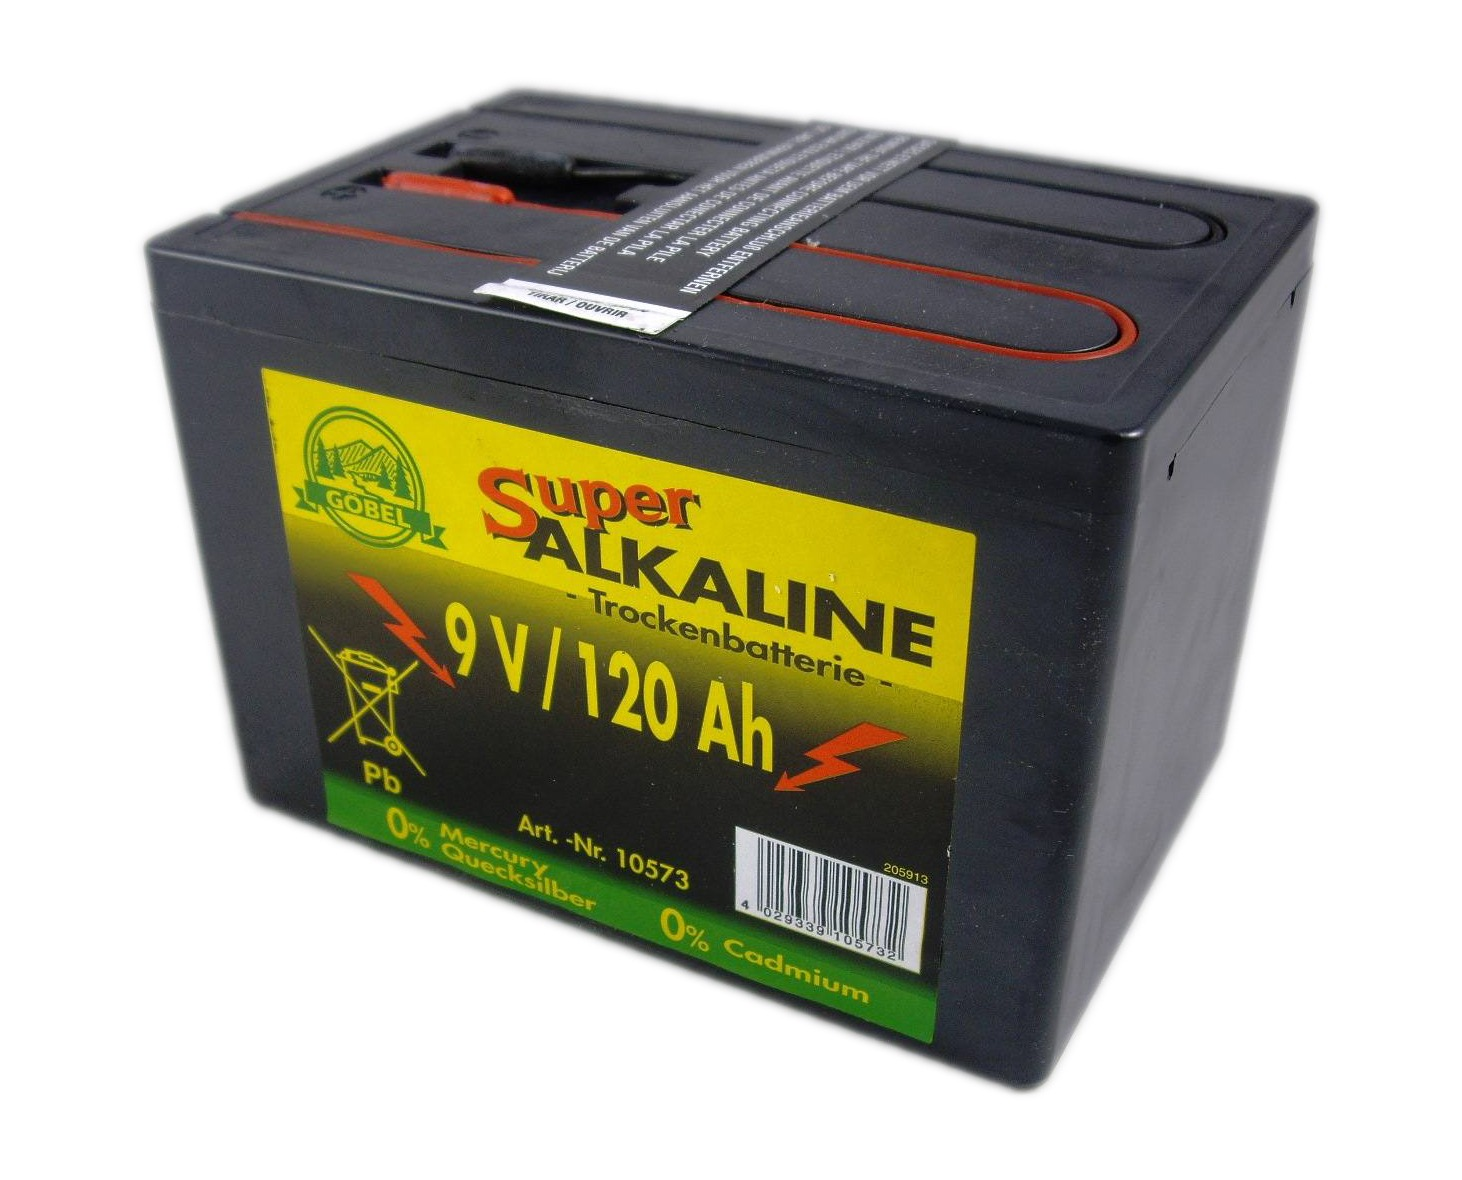 Batterie 9V//75Ah Alkaline Weidezaunbatterie für Elektrozaun Trockenbatterie